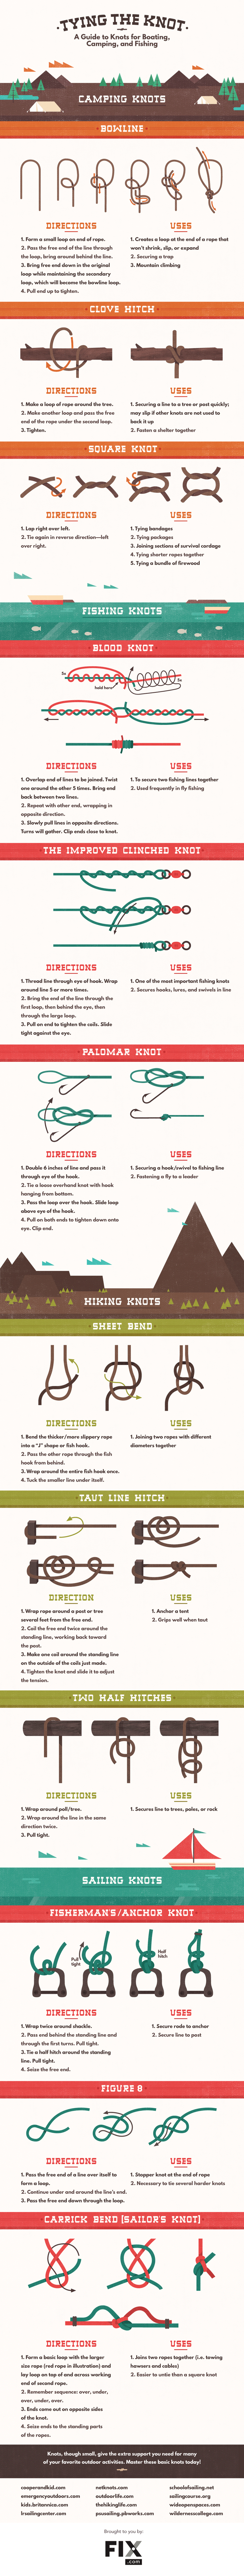 12 essential knots - BUCKFISH